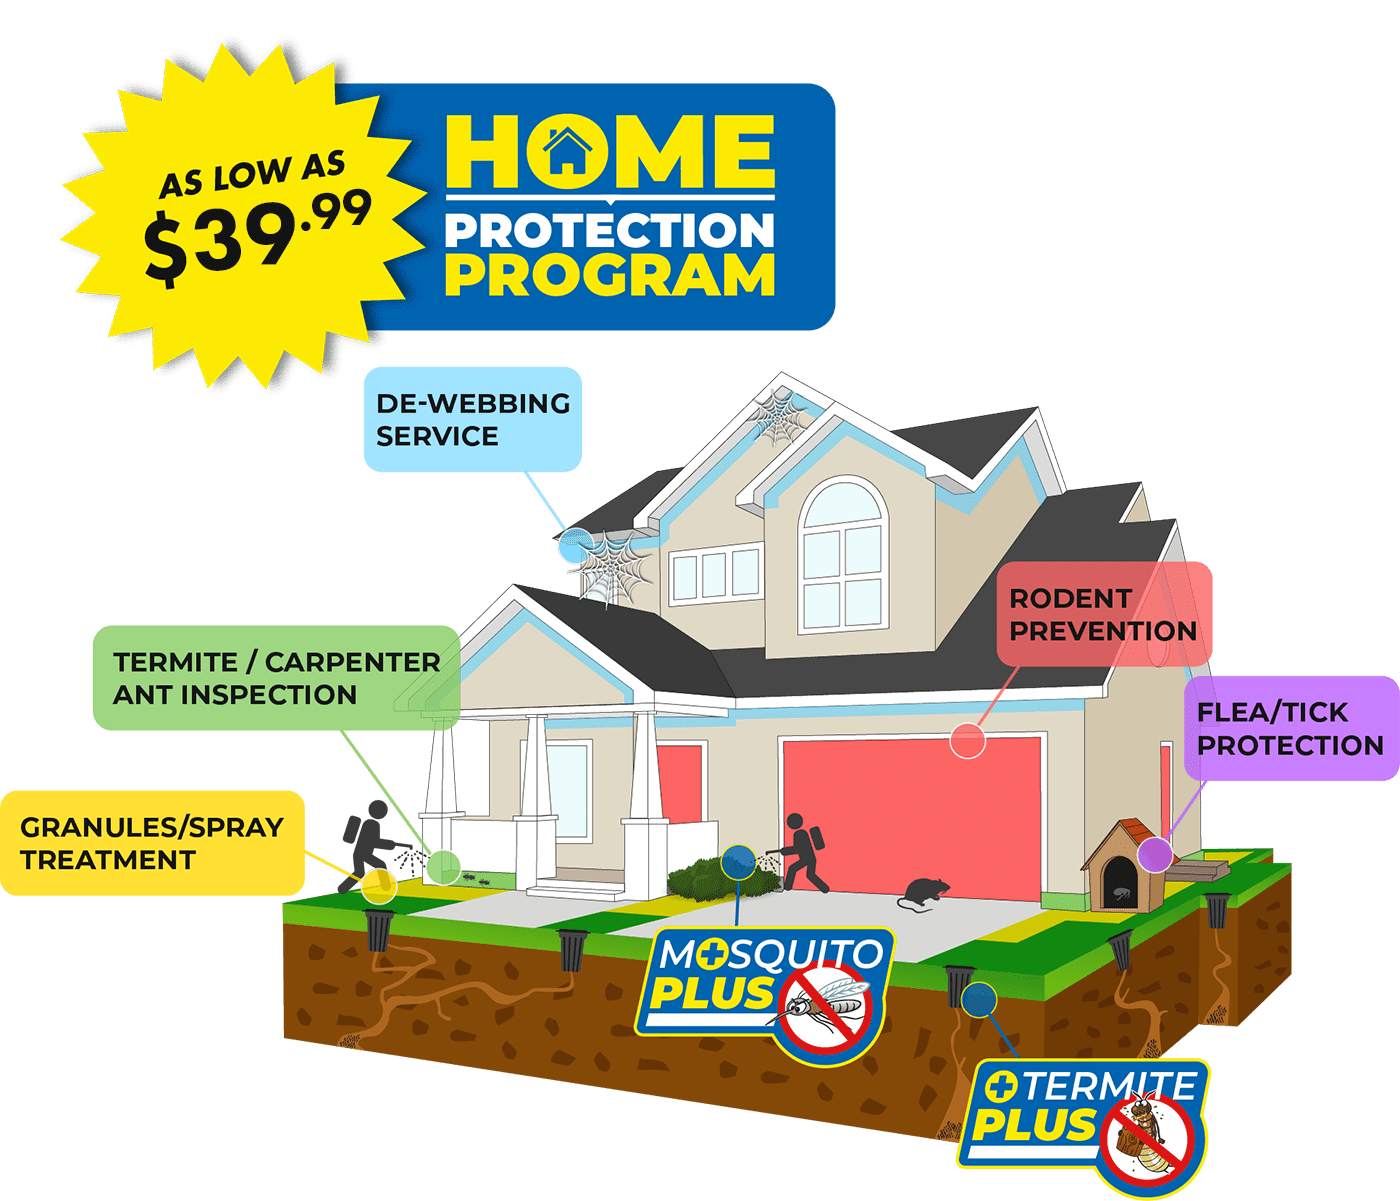 Home illustration of Home Protection Program Blue Beetle Pest Control